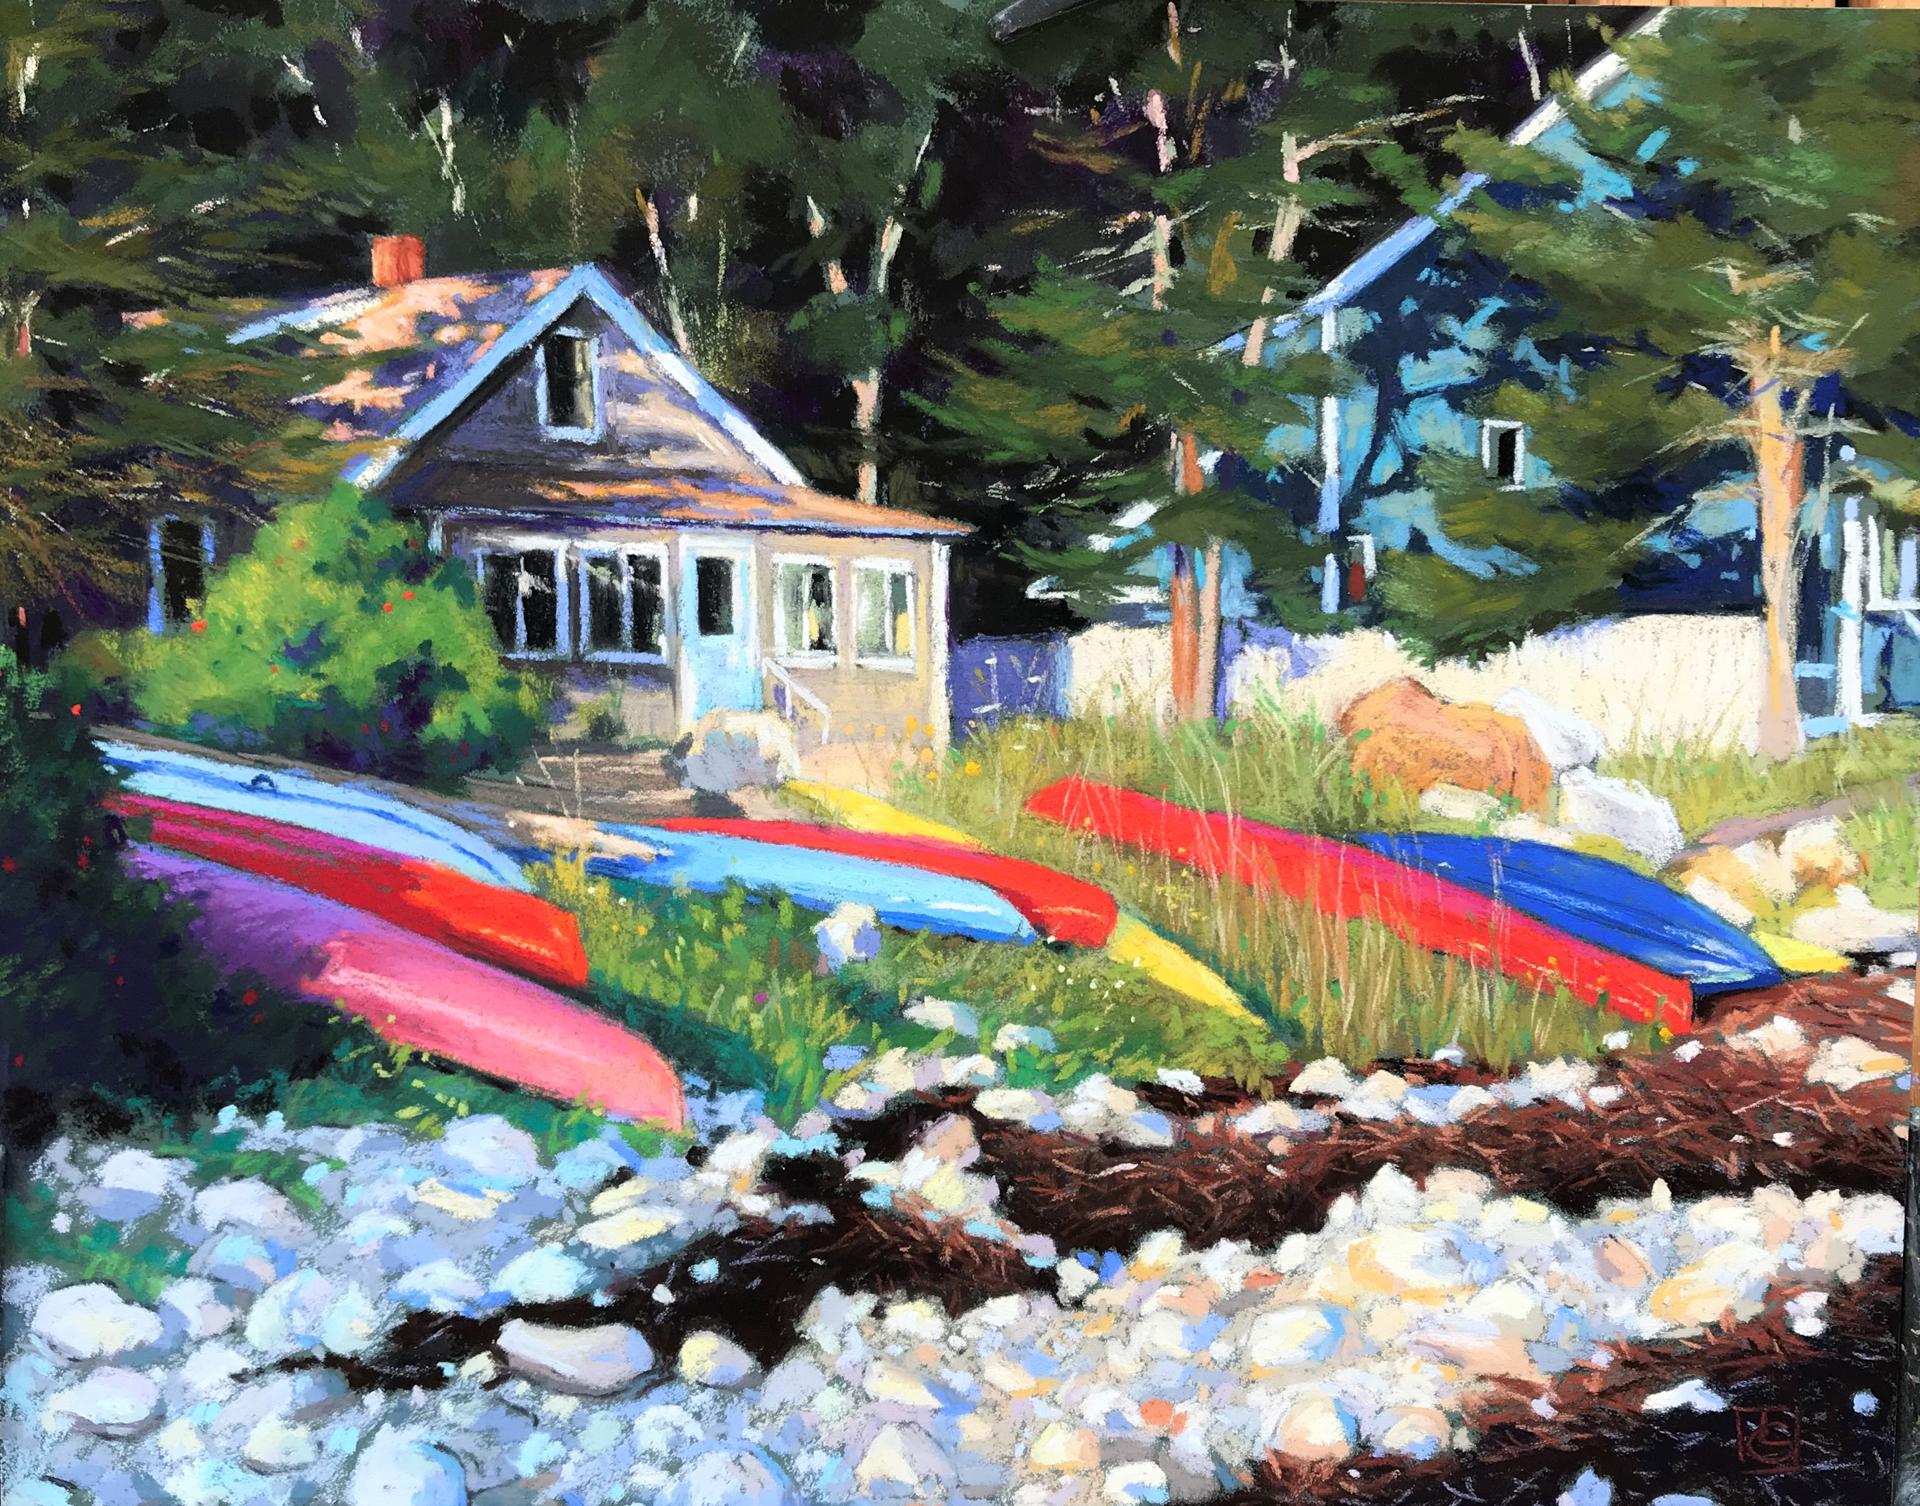 Season's End by Lisa Gleim